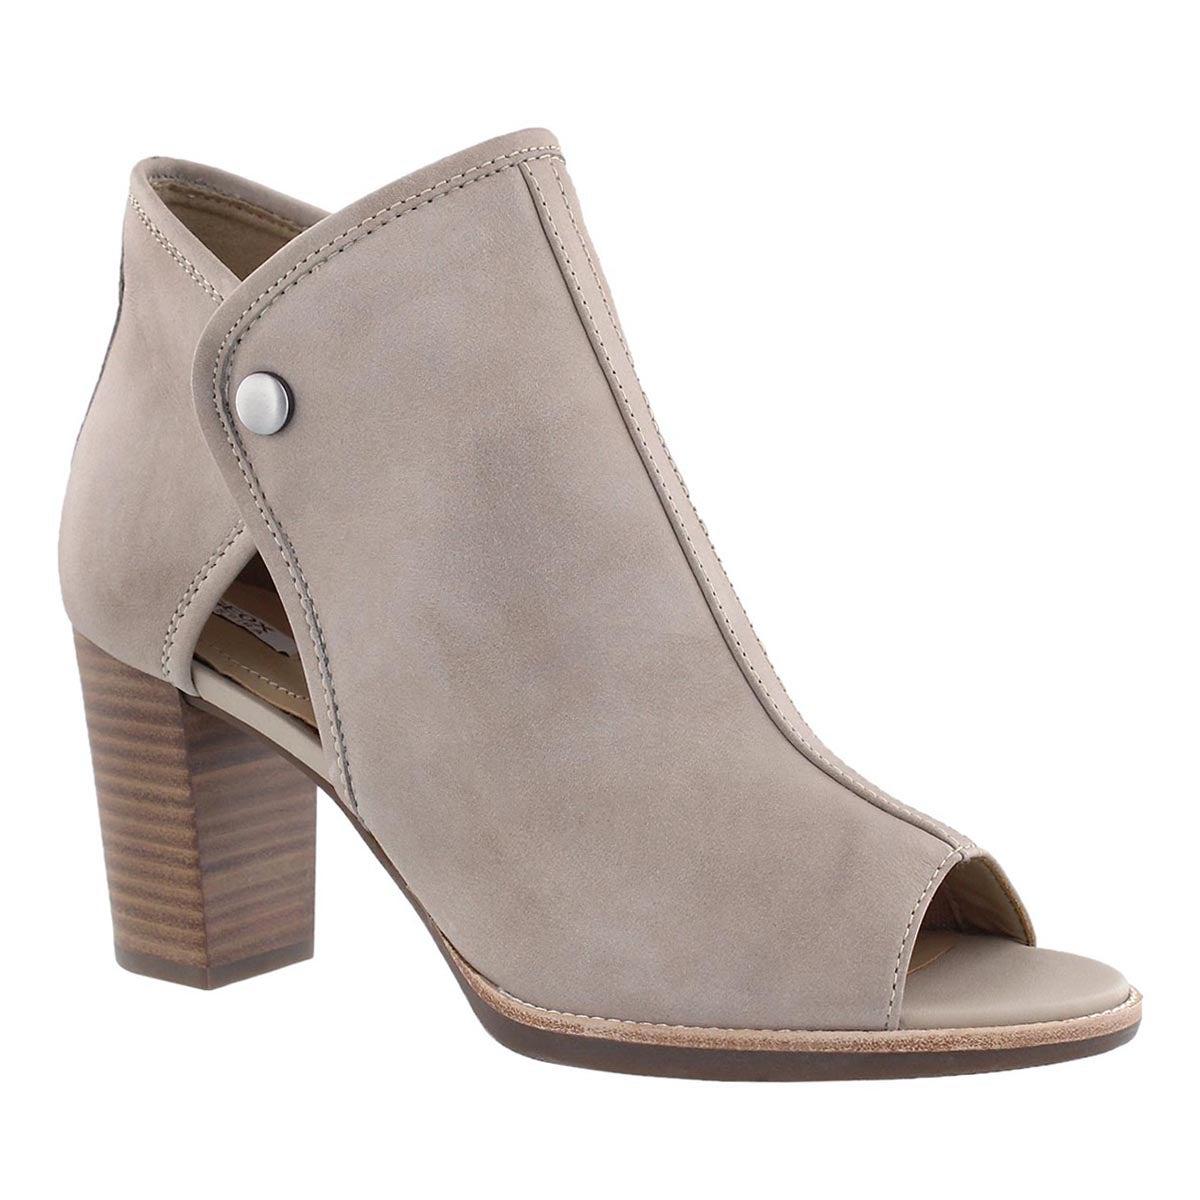 Women's CALLIE light taupe peep toe dress booties